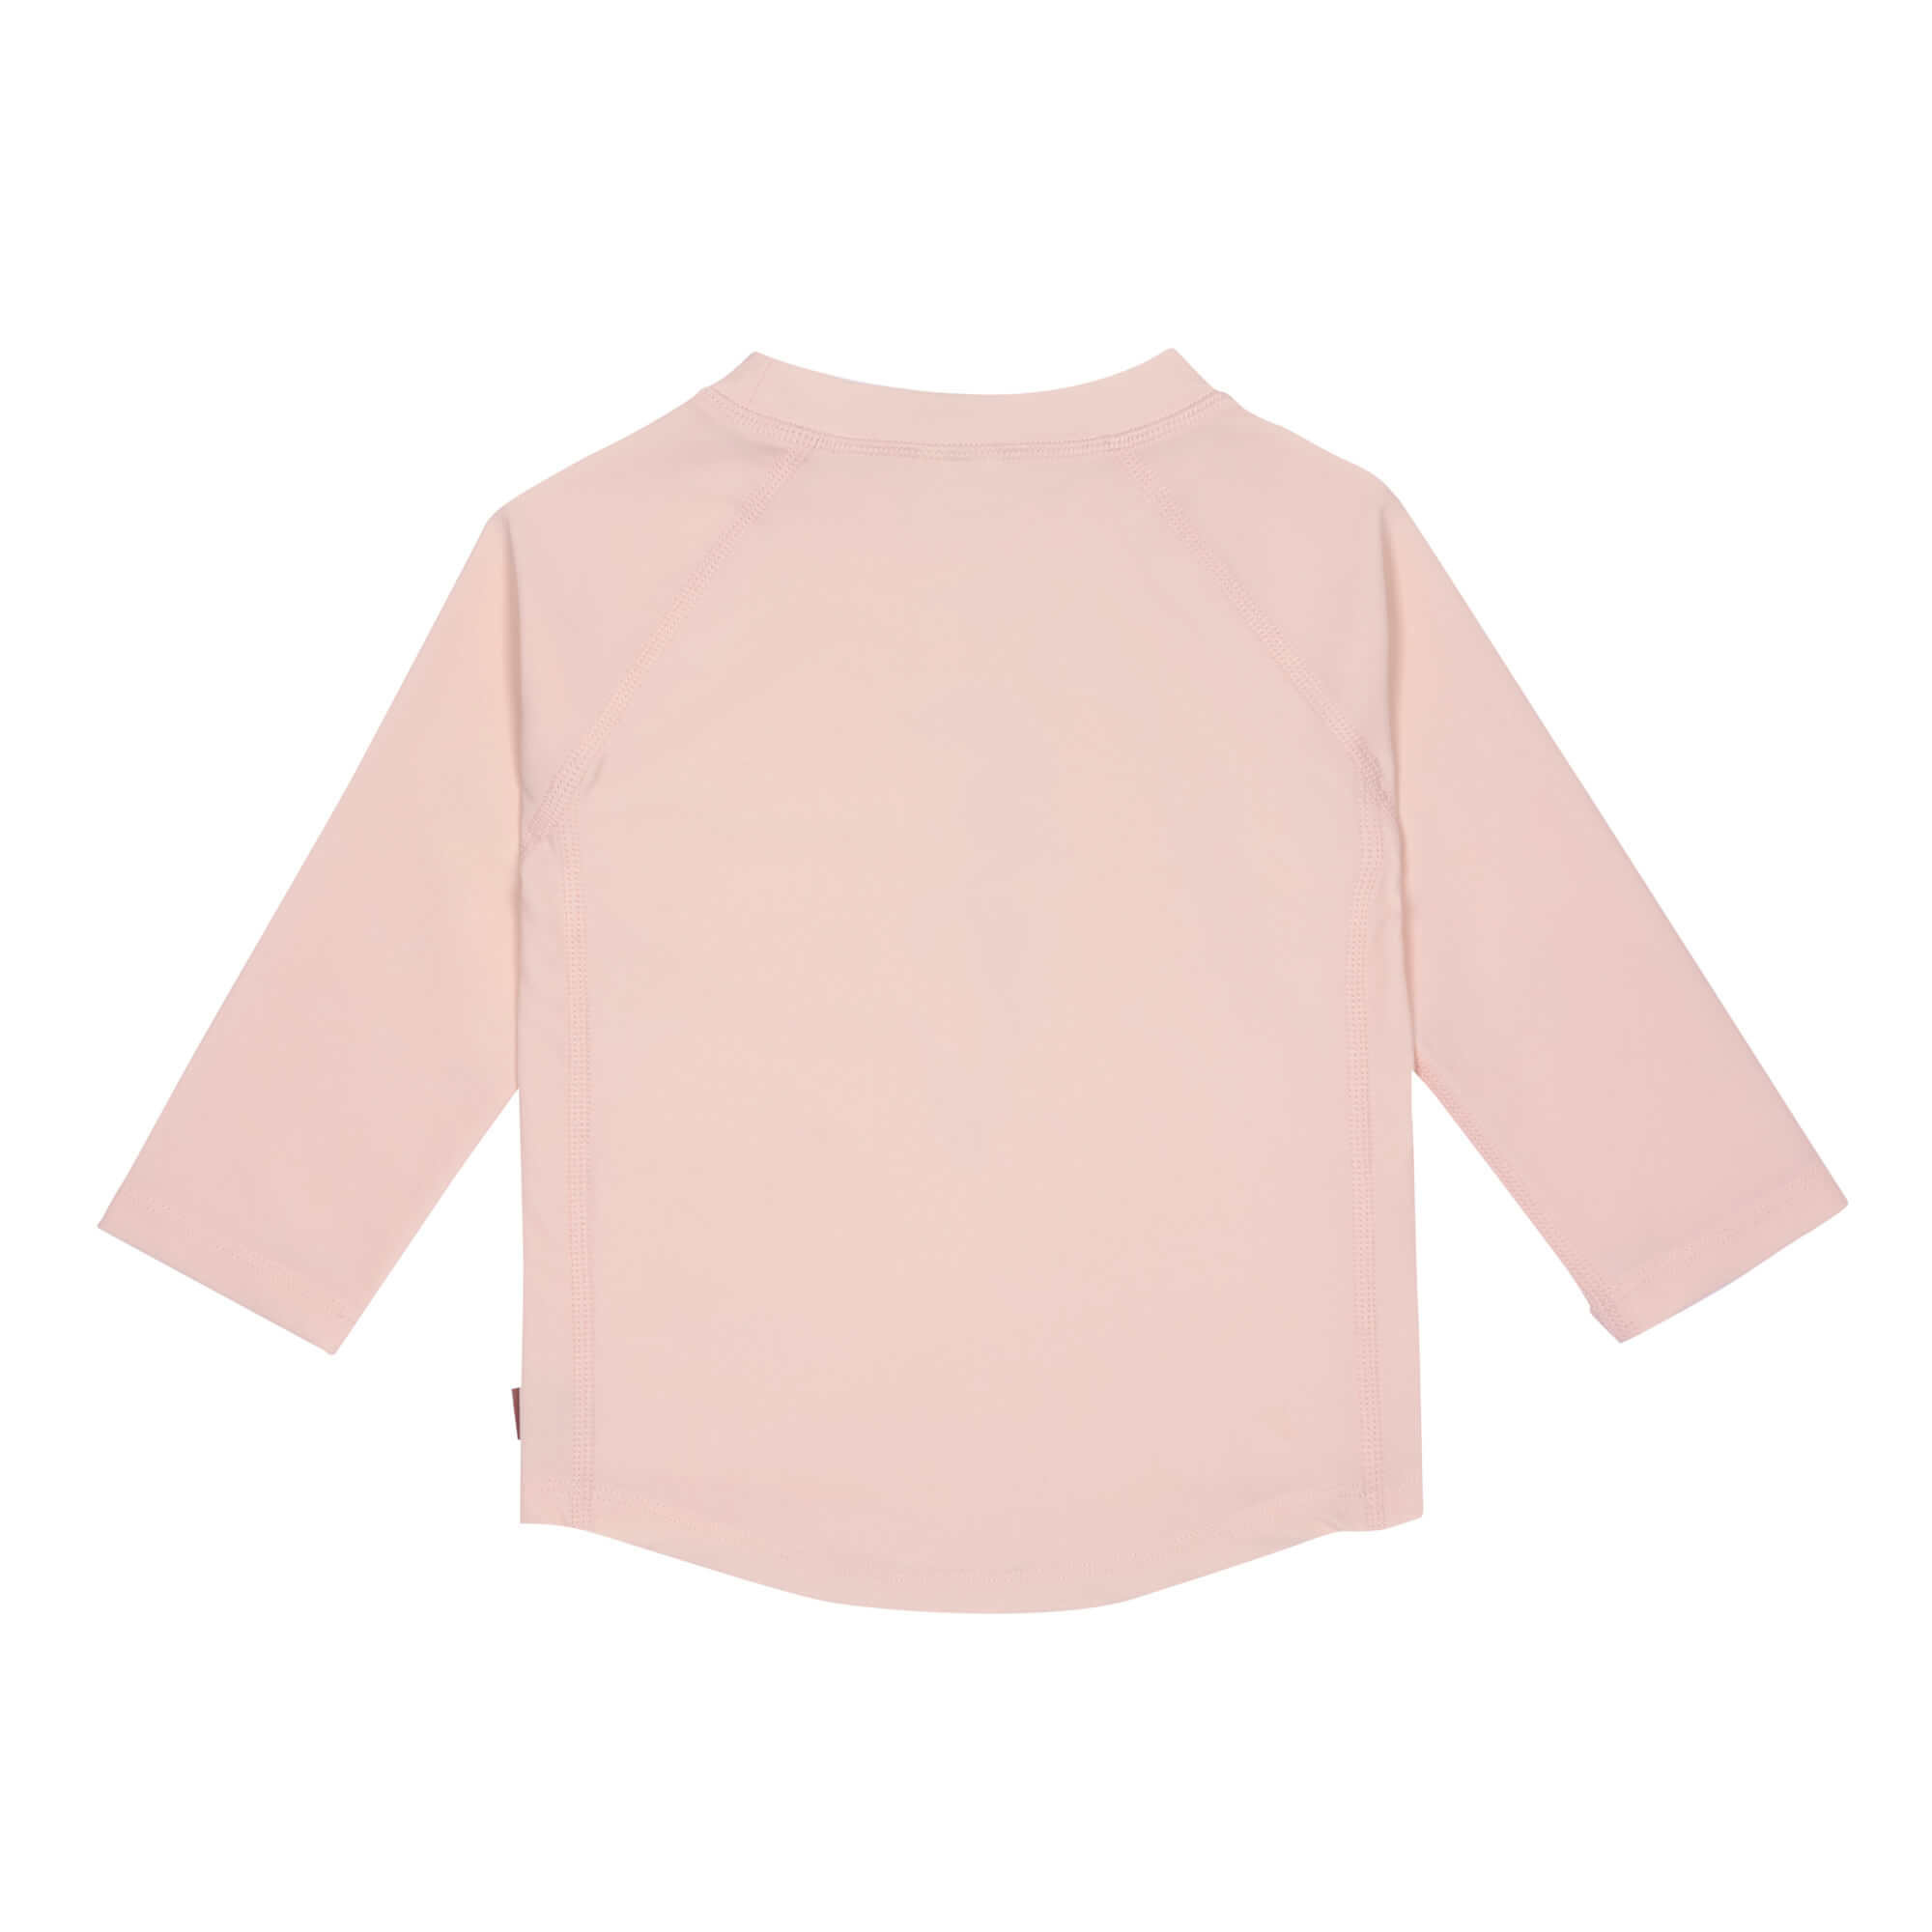 Lässig Lässig Splash & Fun Lange mouw Rashguard UV zwemshirt – Icecream rose